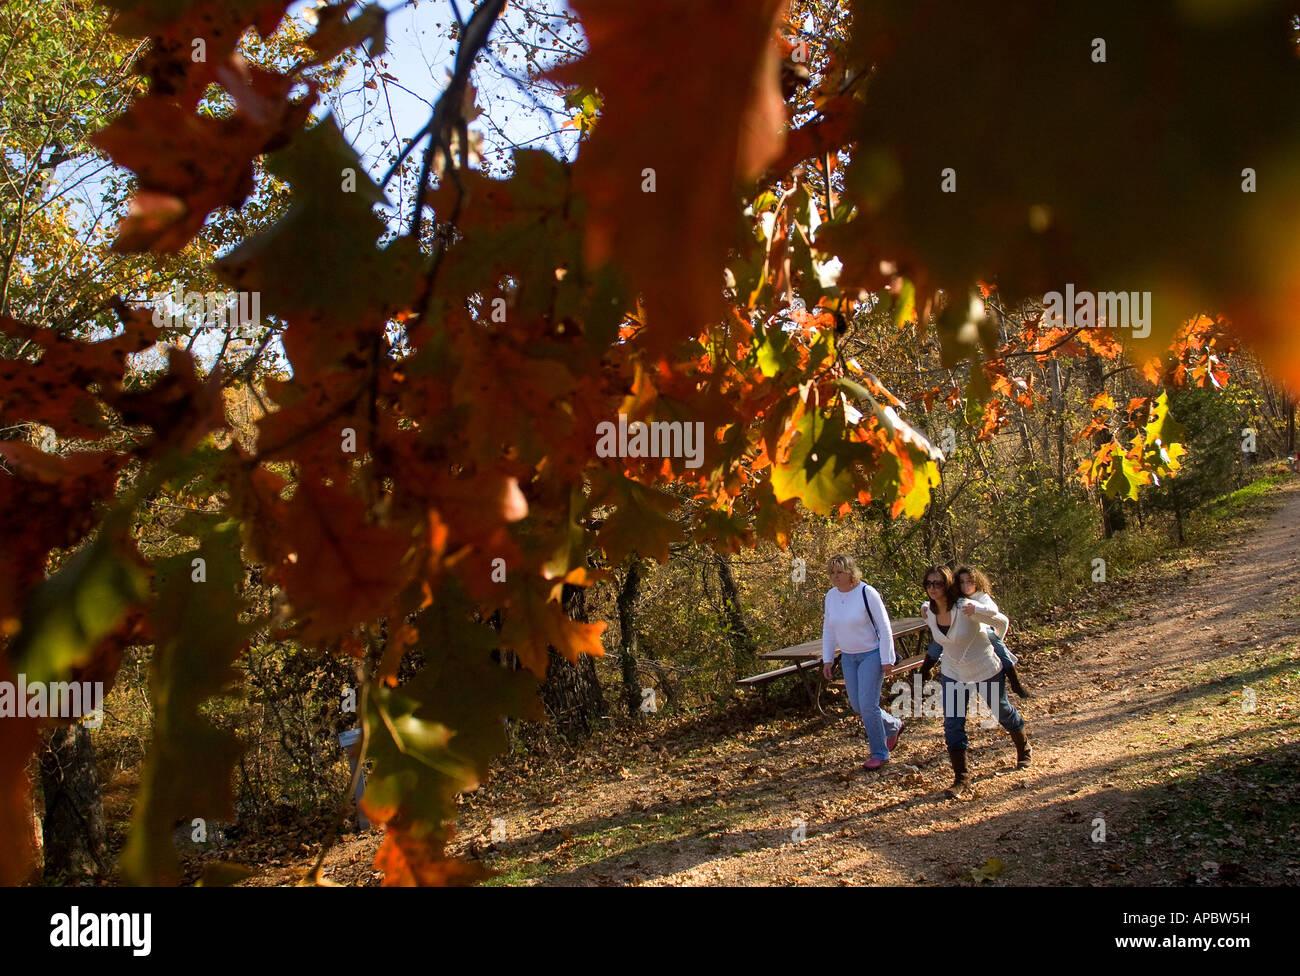 Outdoor enthusiasts walk the Tanyard Creek Trail in Bella Vista, Ark. Stock Photo